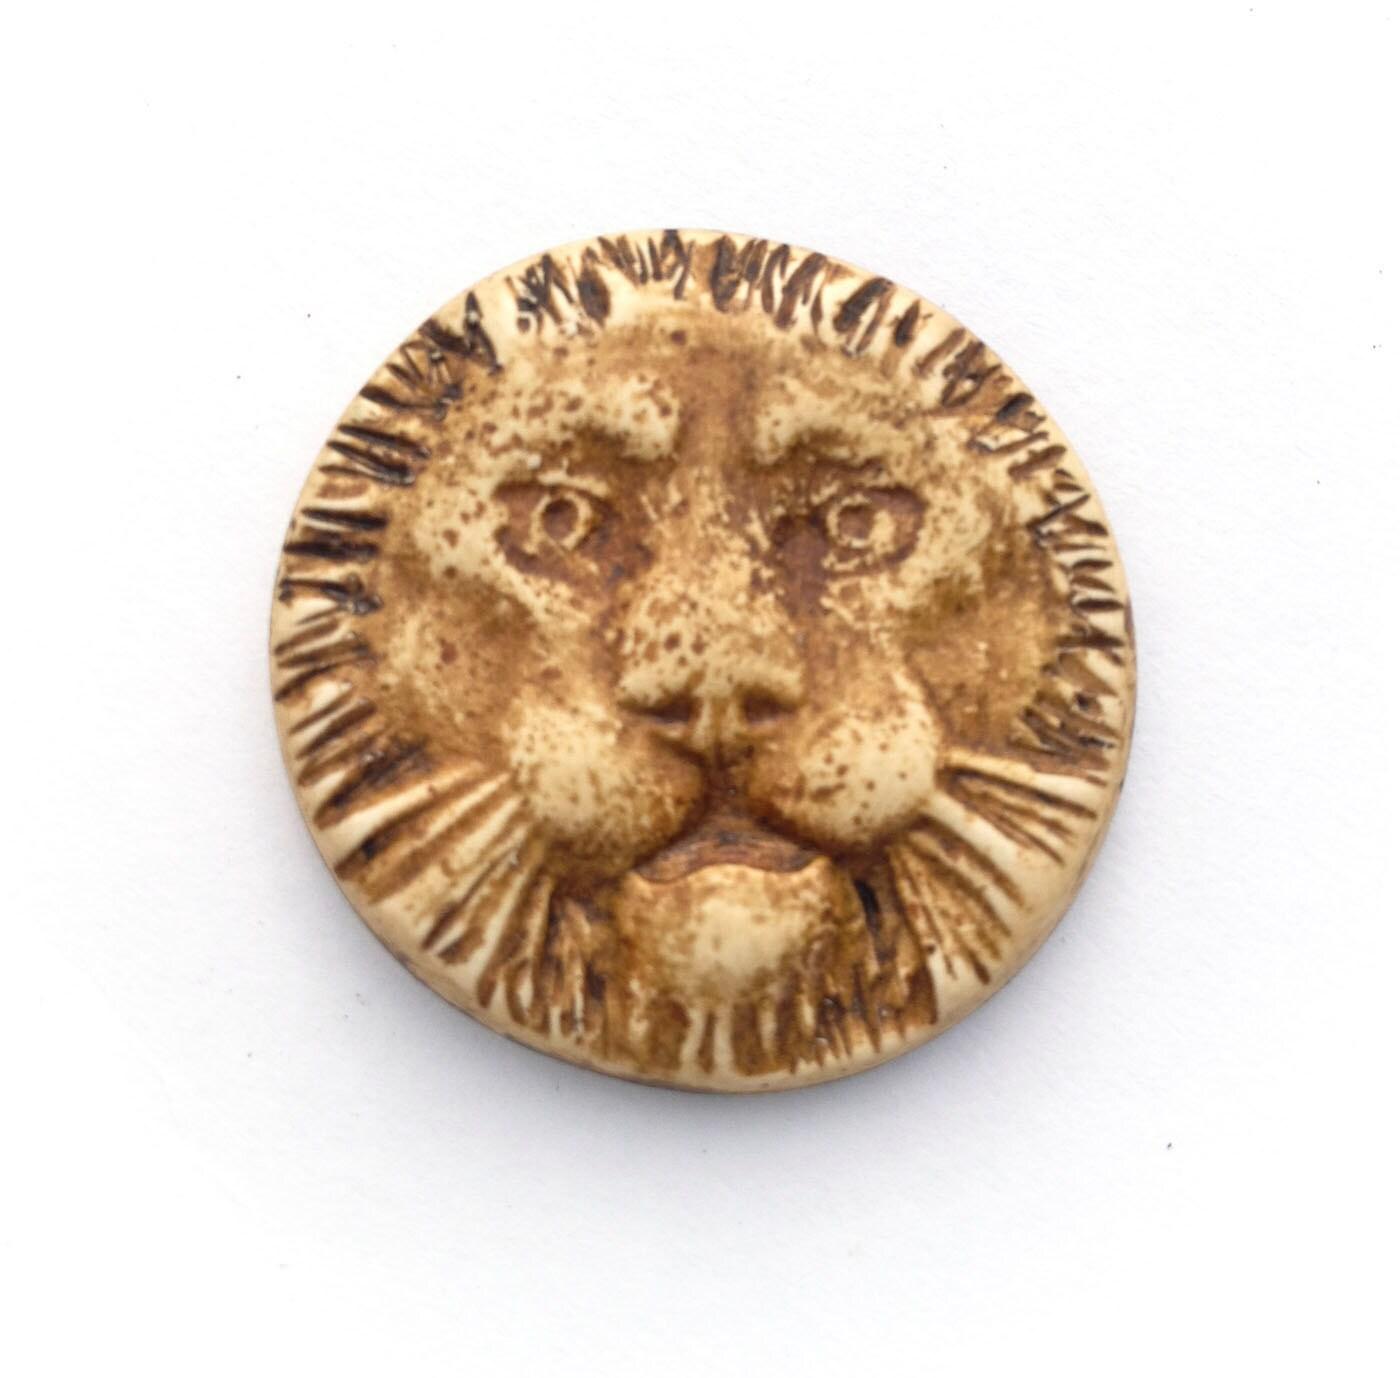 Lion Face Polymer Clay Pendant - Distlefunk2